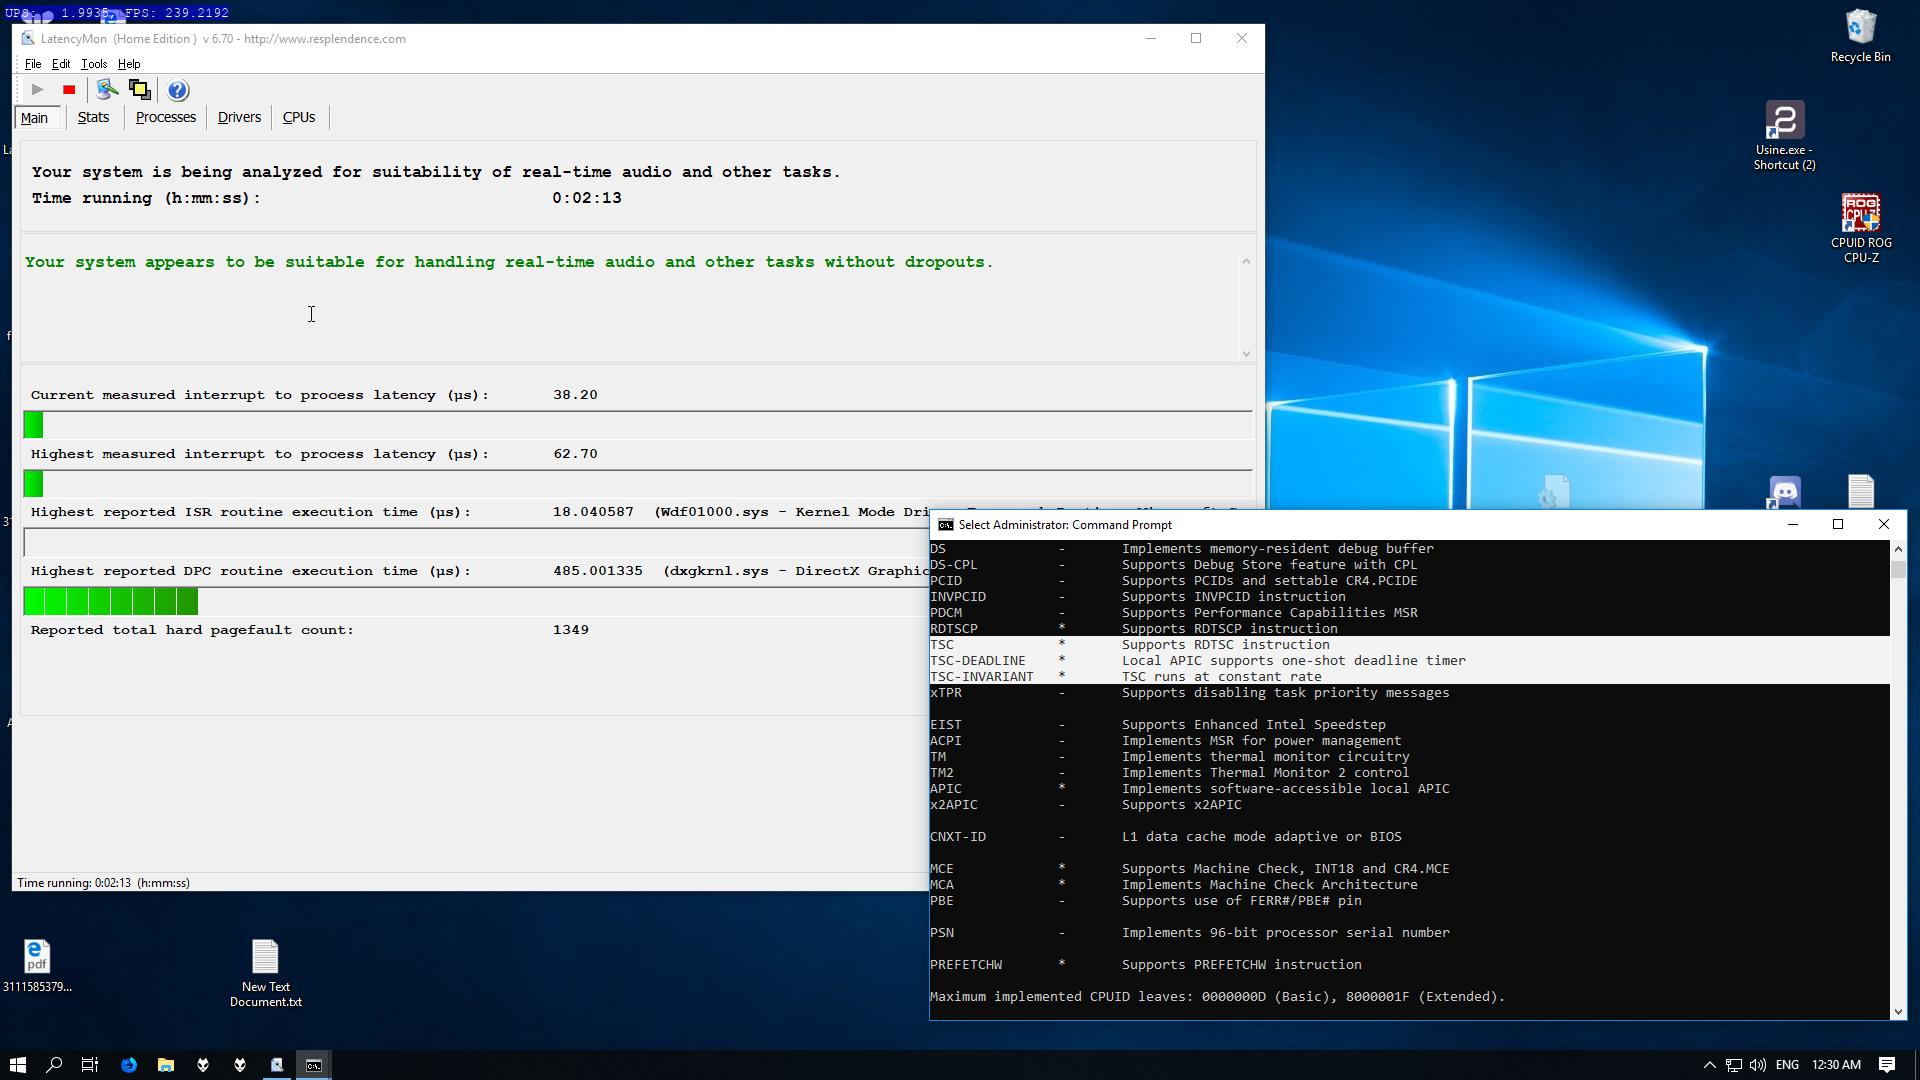 Increasing VFIO VGA Performance - Linux - Level1Techs Forums